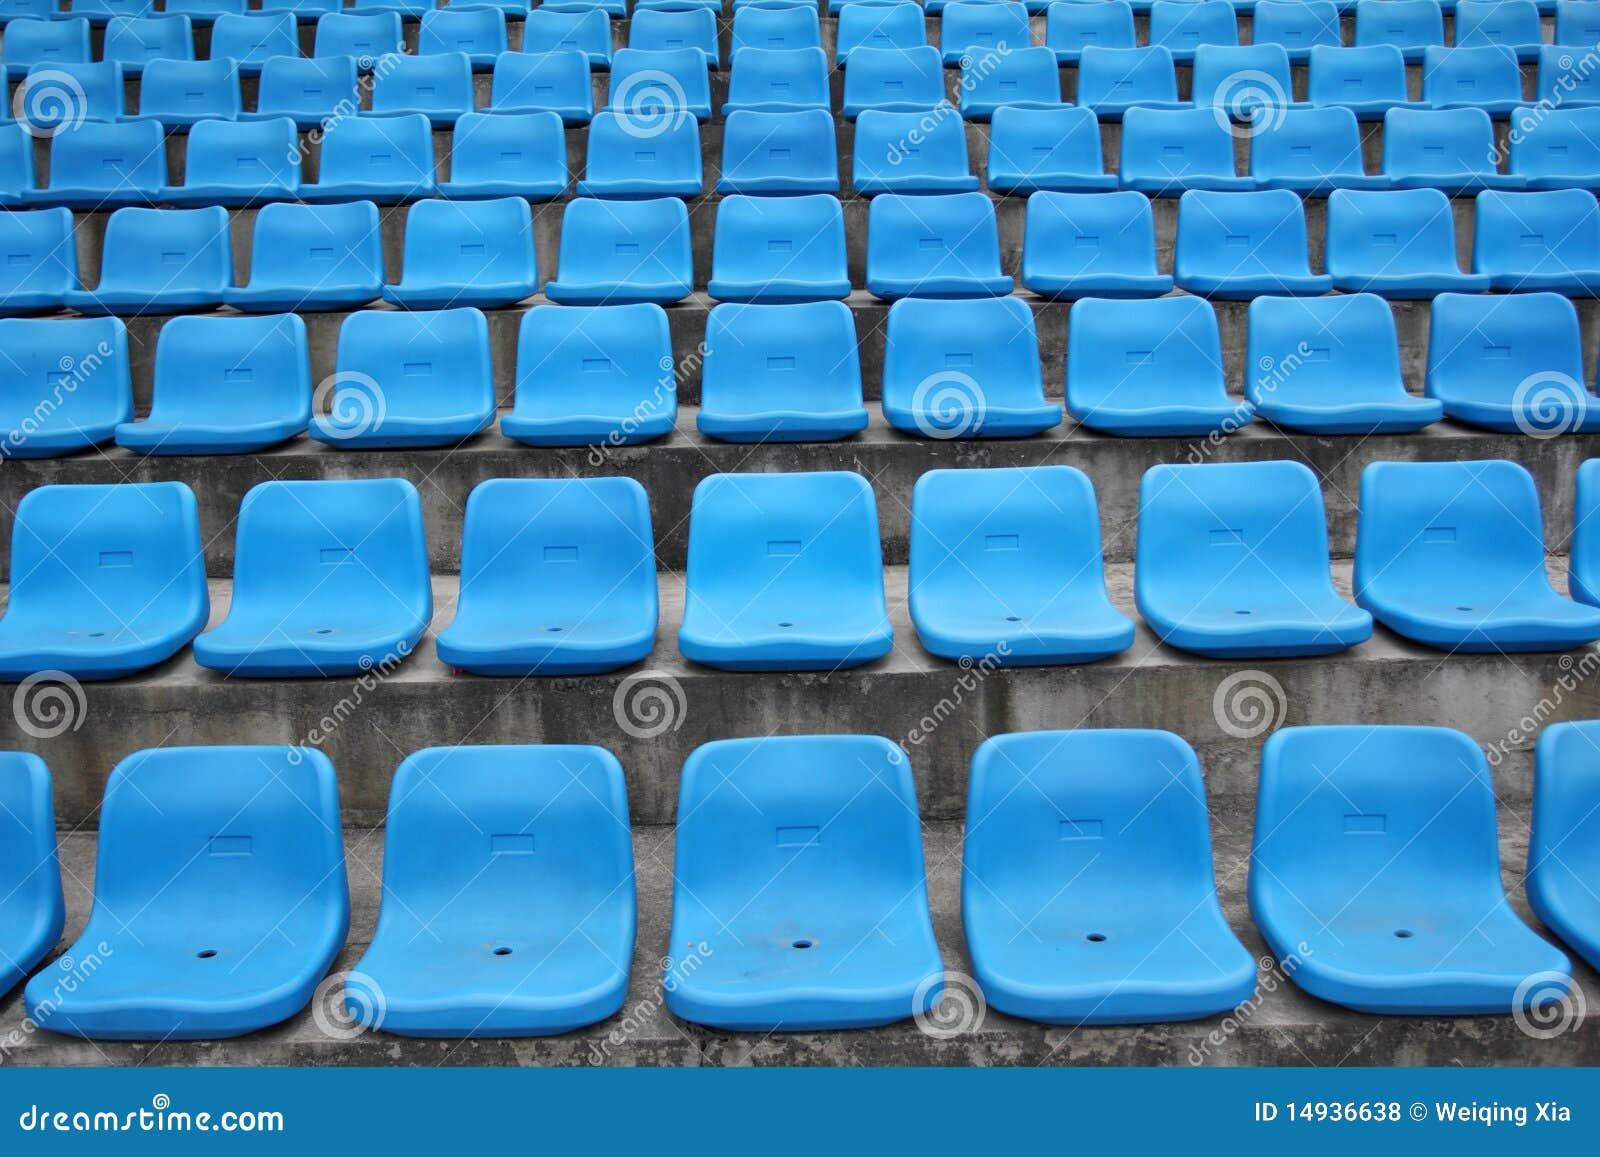 Seats In Stadium Royalty Free Stock Photos - Image: 14936638